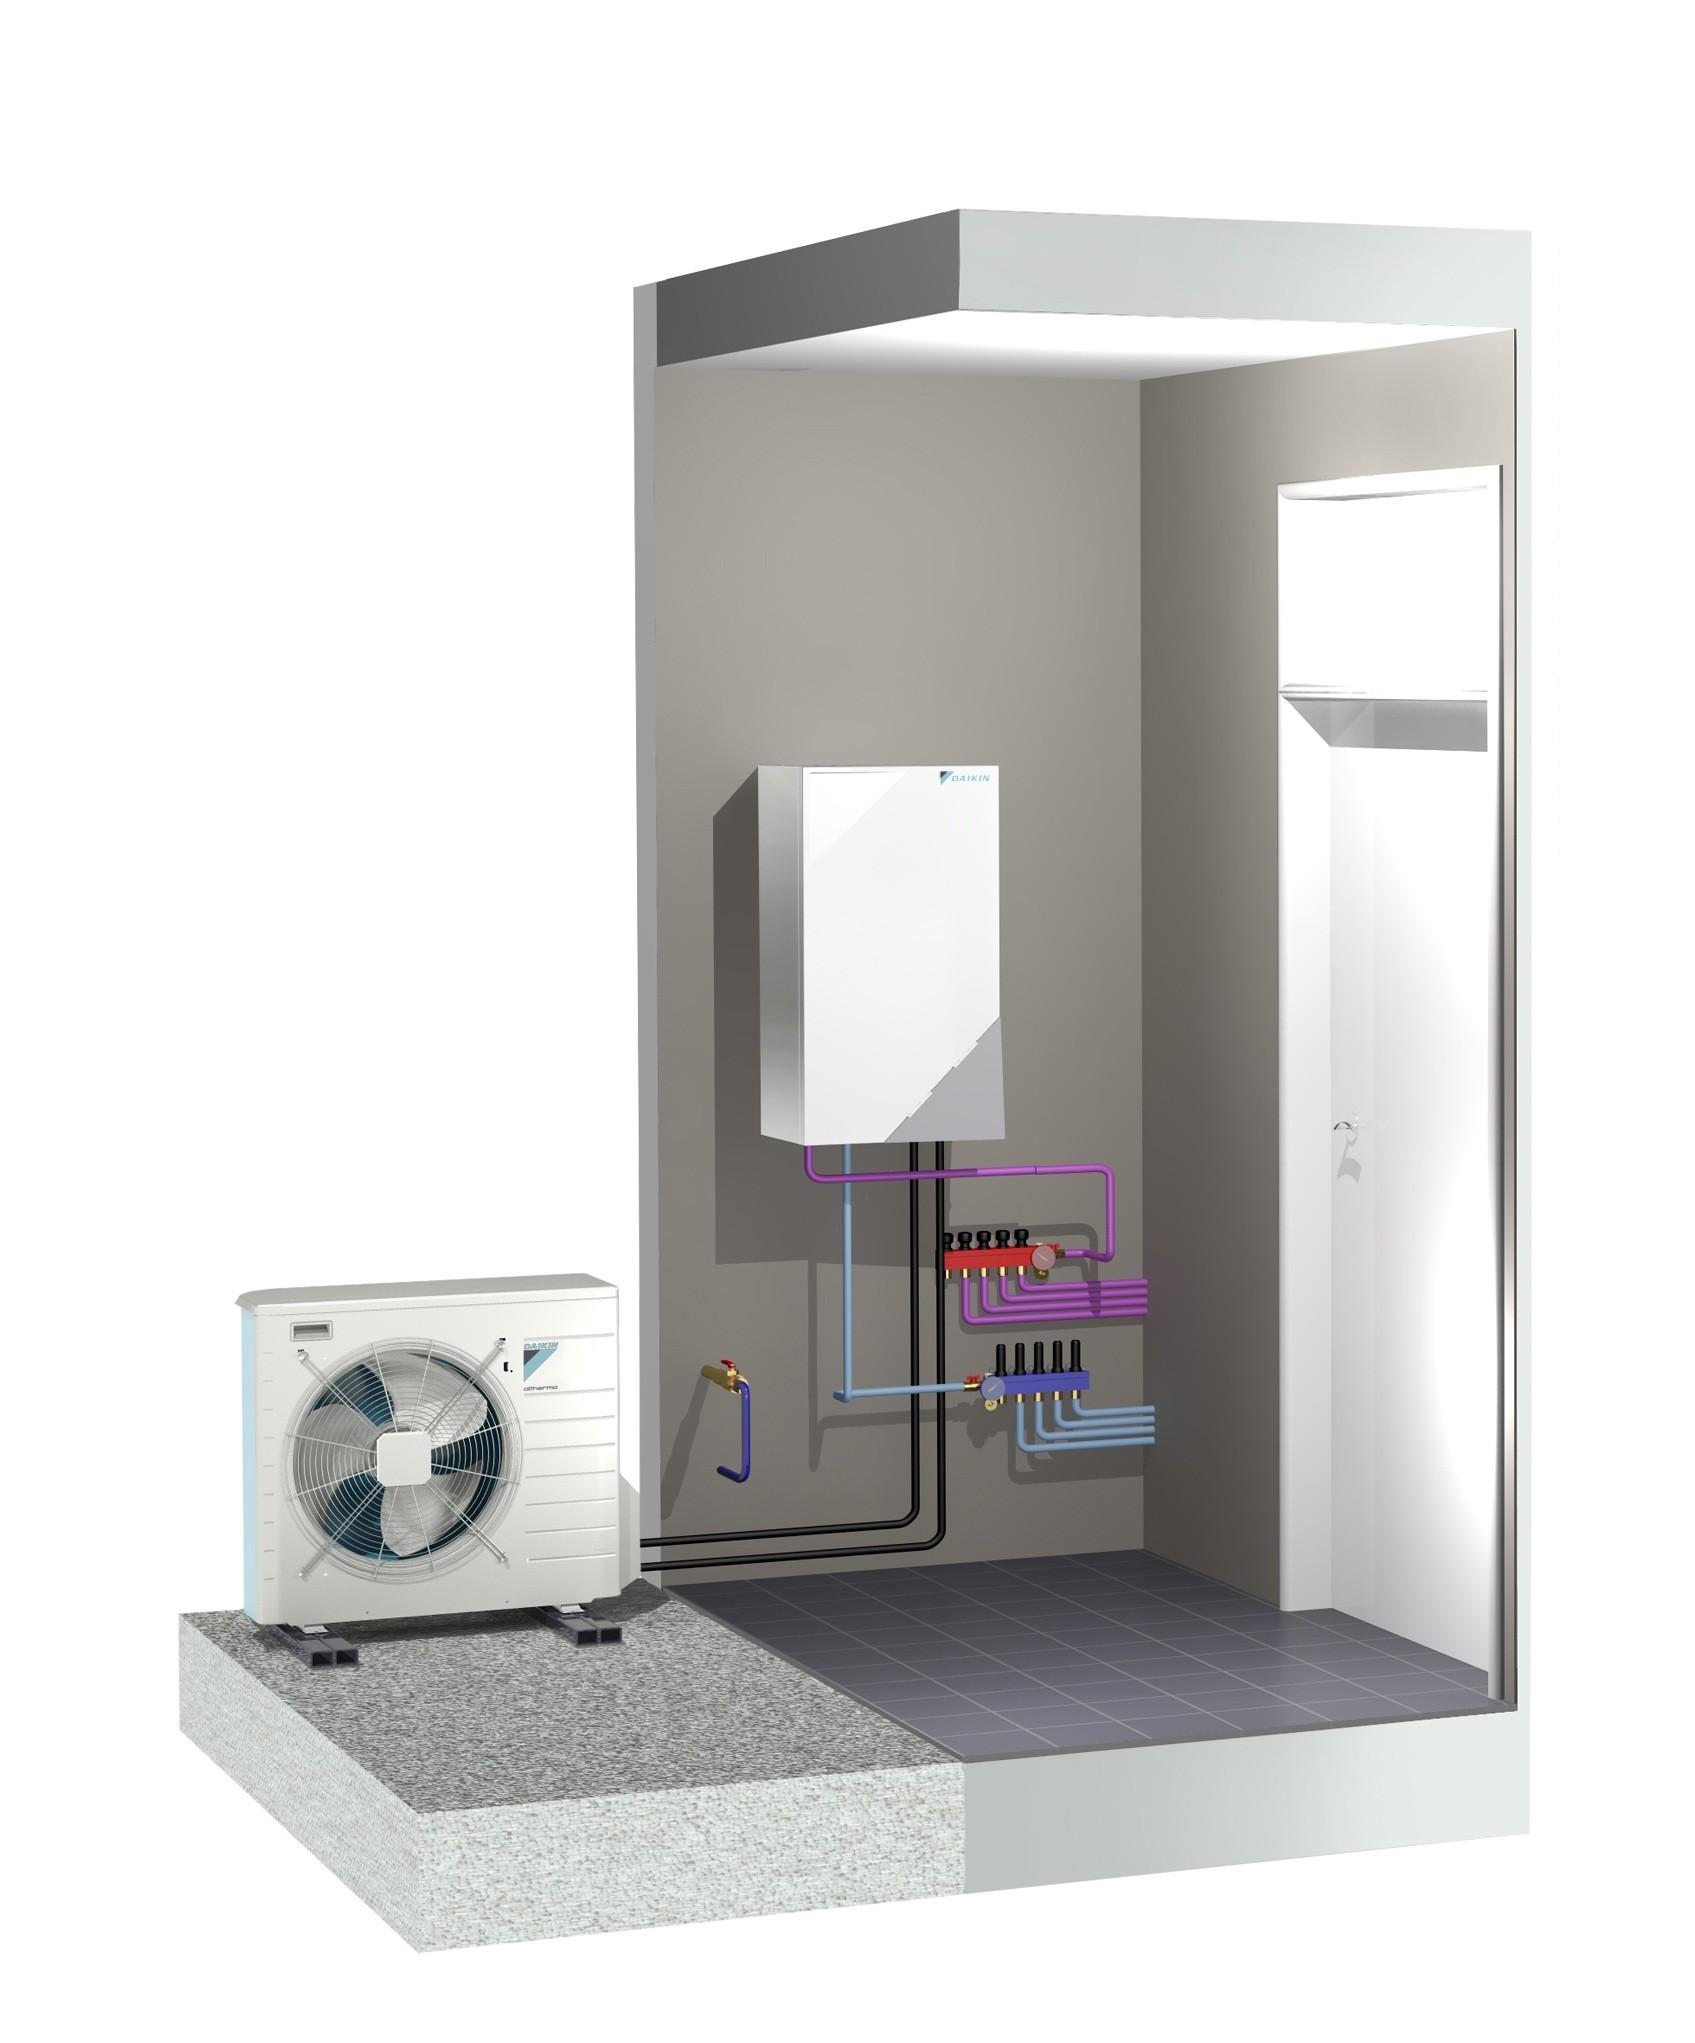 daikin altherma reversible pompe chaleur. Black Bedroom Furniture Sets. Home Design Ideas